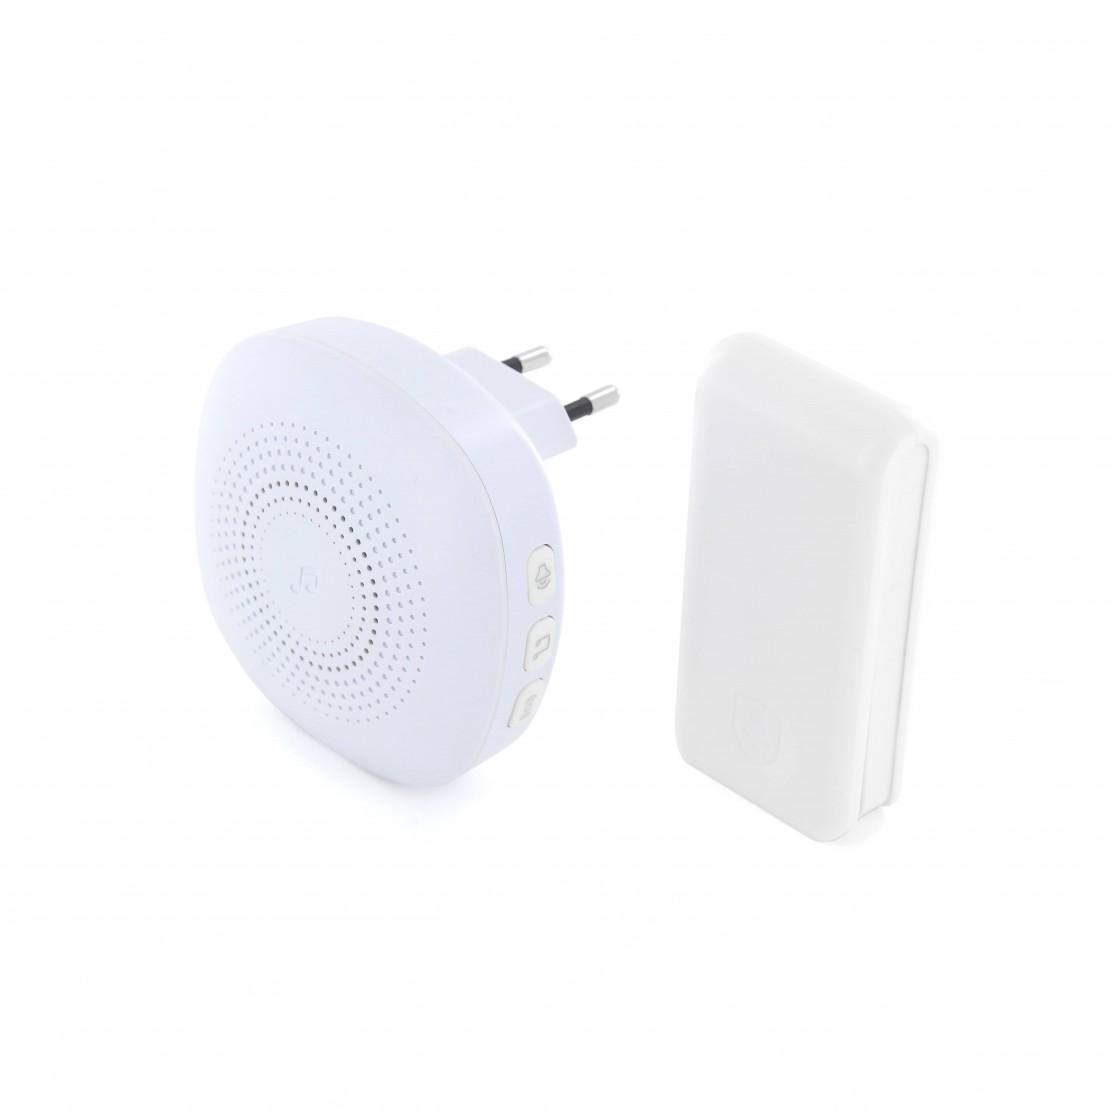 Stylish White Doorbell Wireless And Battery Free Doorbell